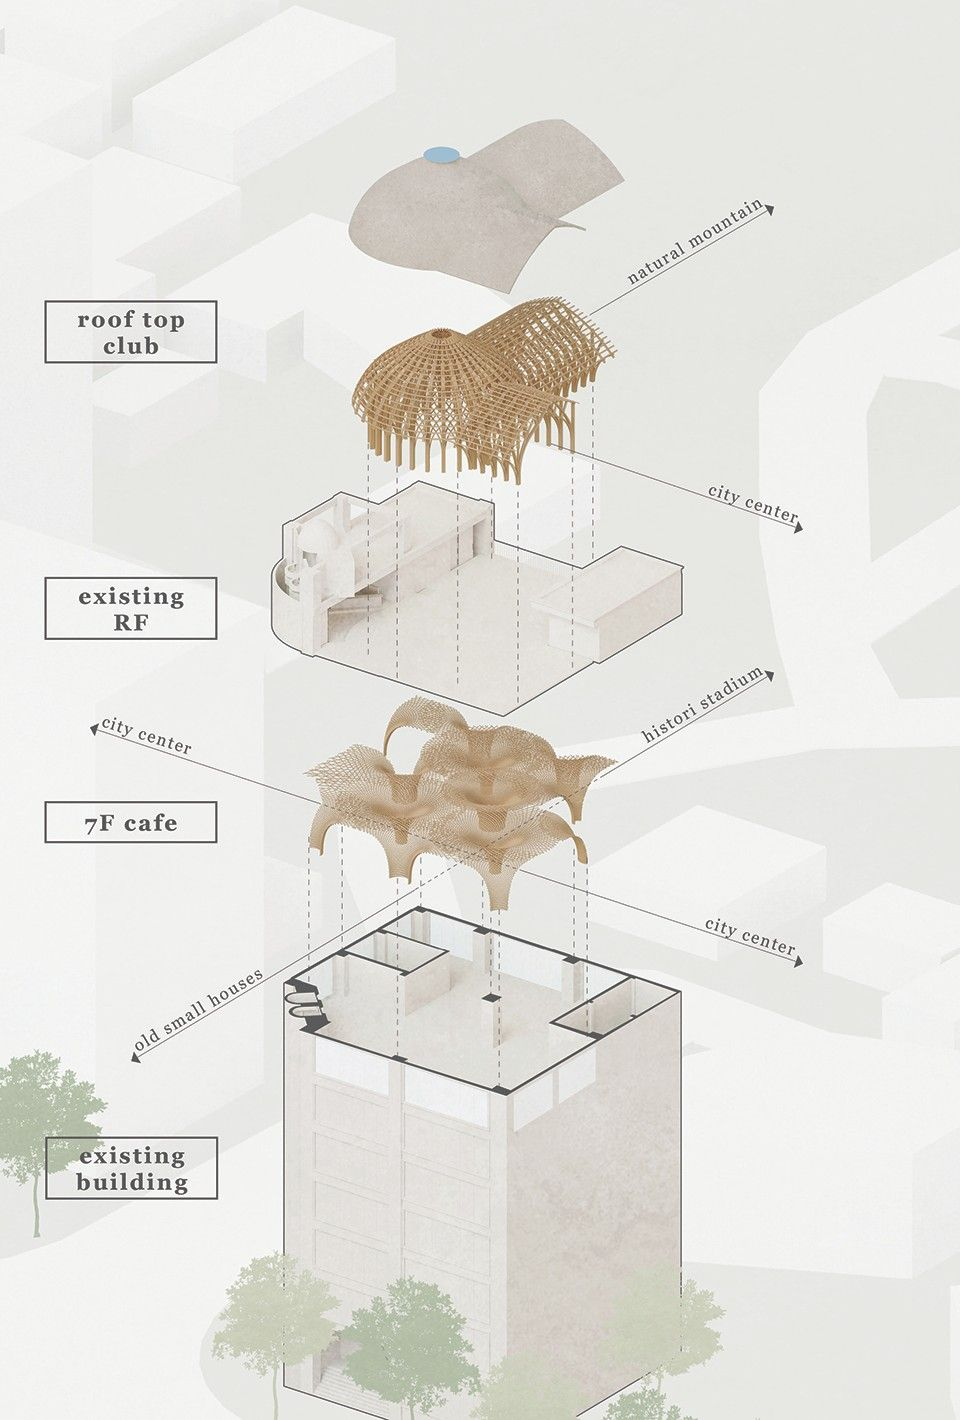 Nocenco咖啡厅,越南 / VTN architects